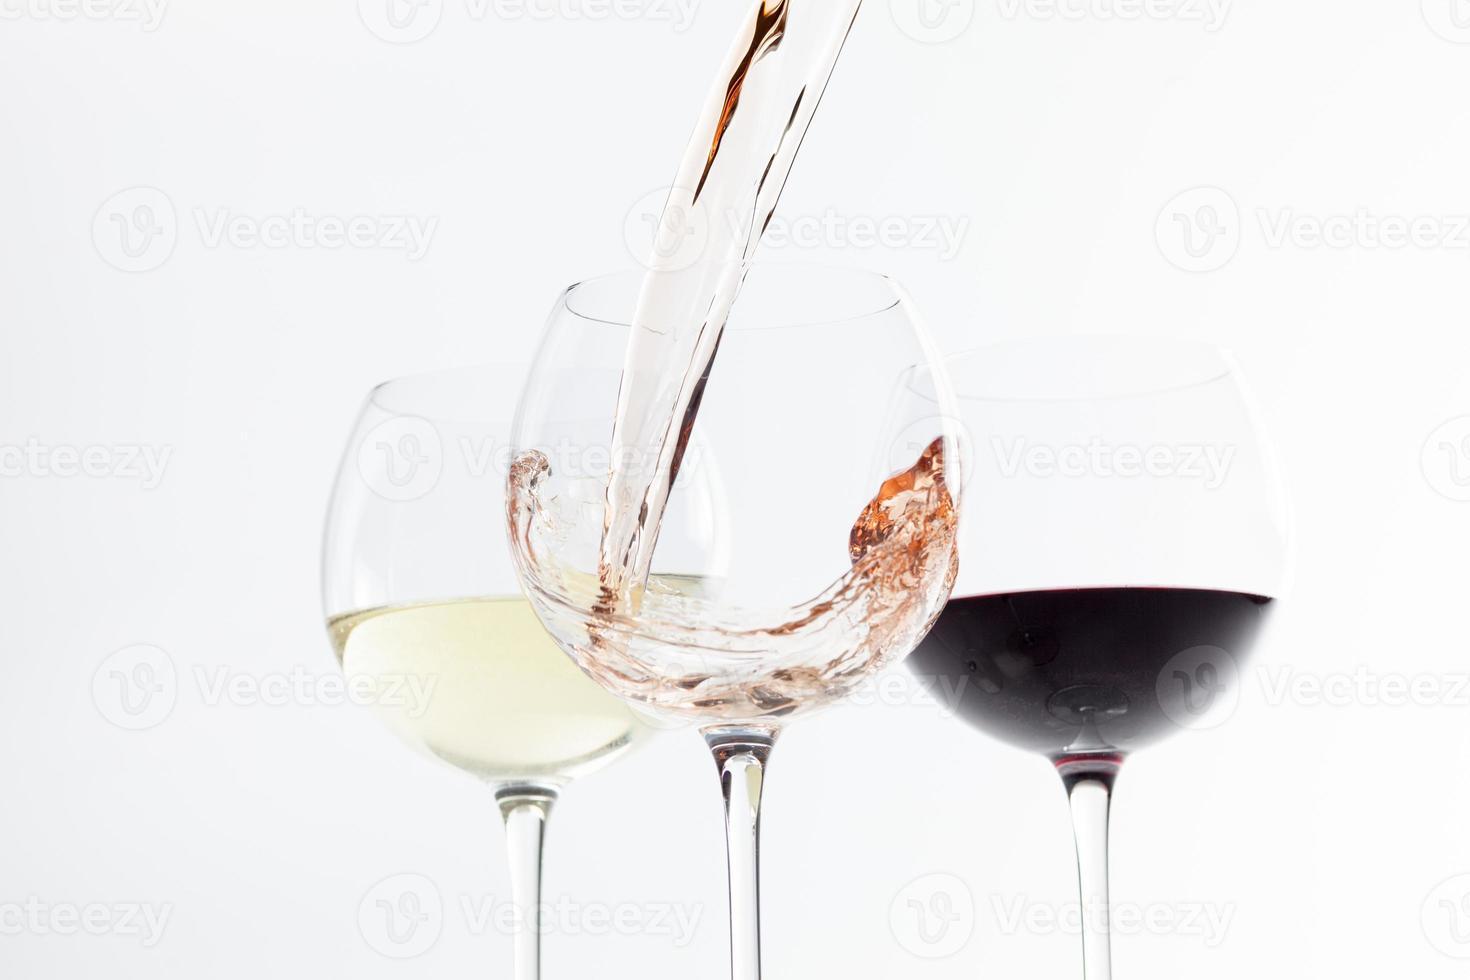 copas de vino sobre fondo blanco foto